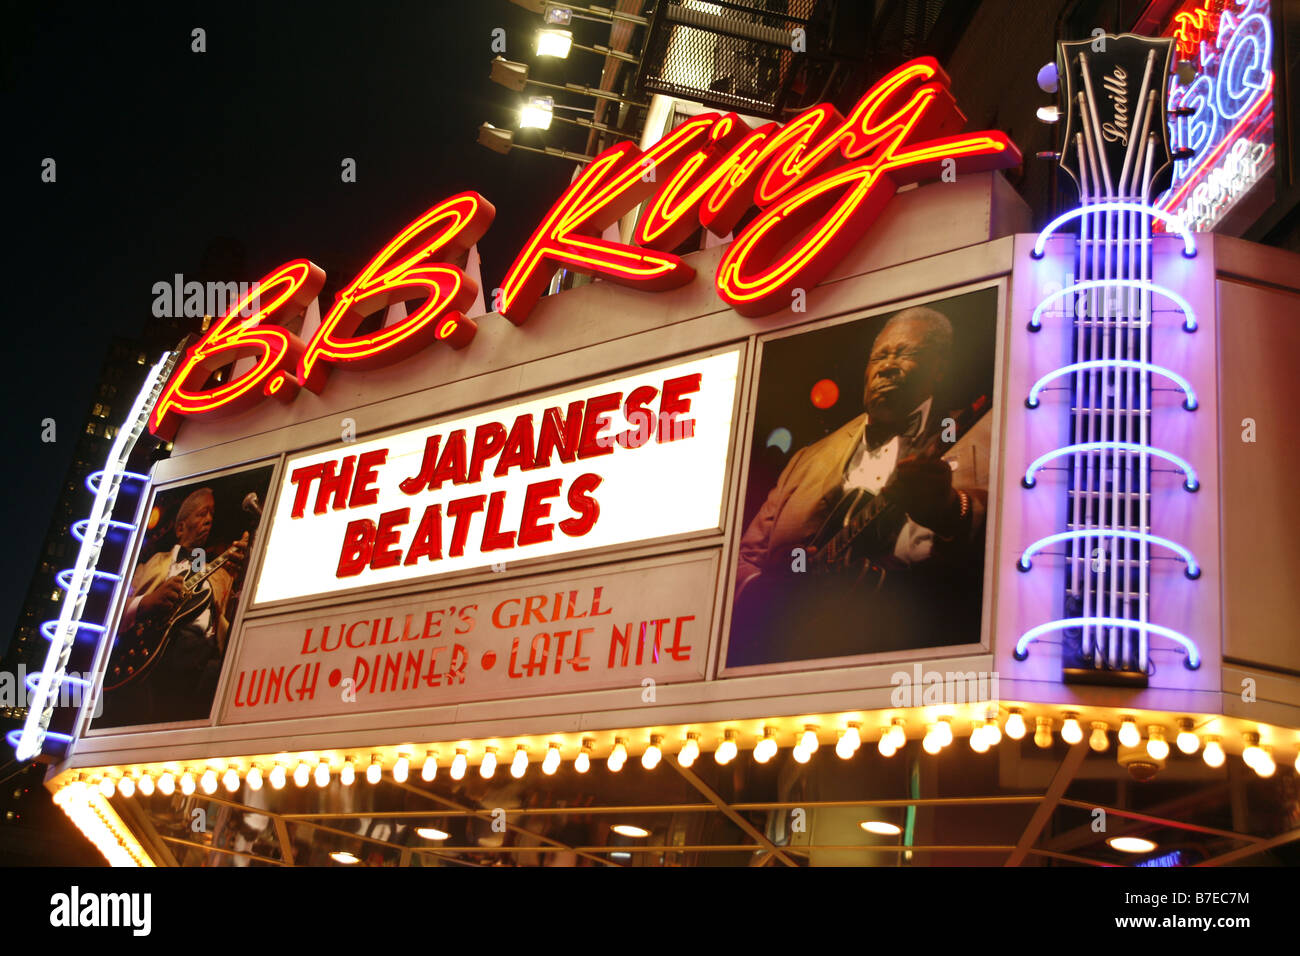 B. B. King Blues Club, New York City, USA Stock Photo